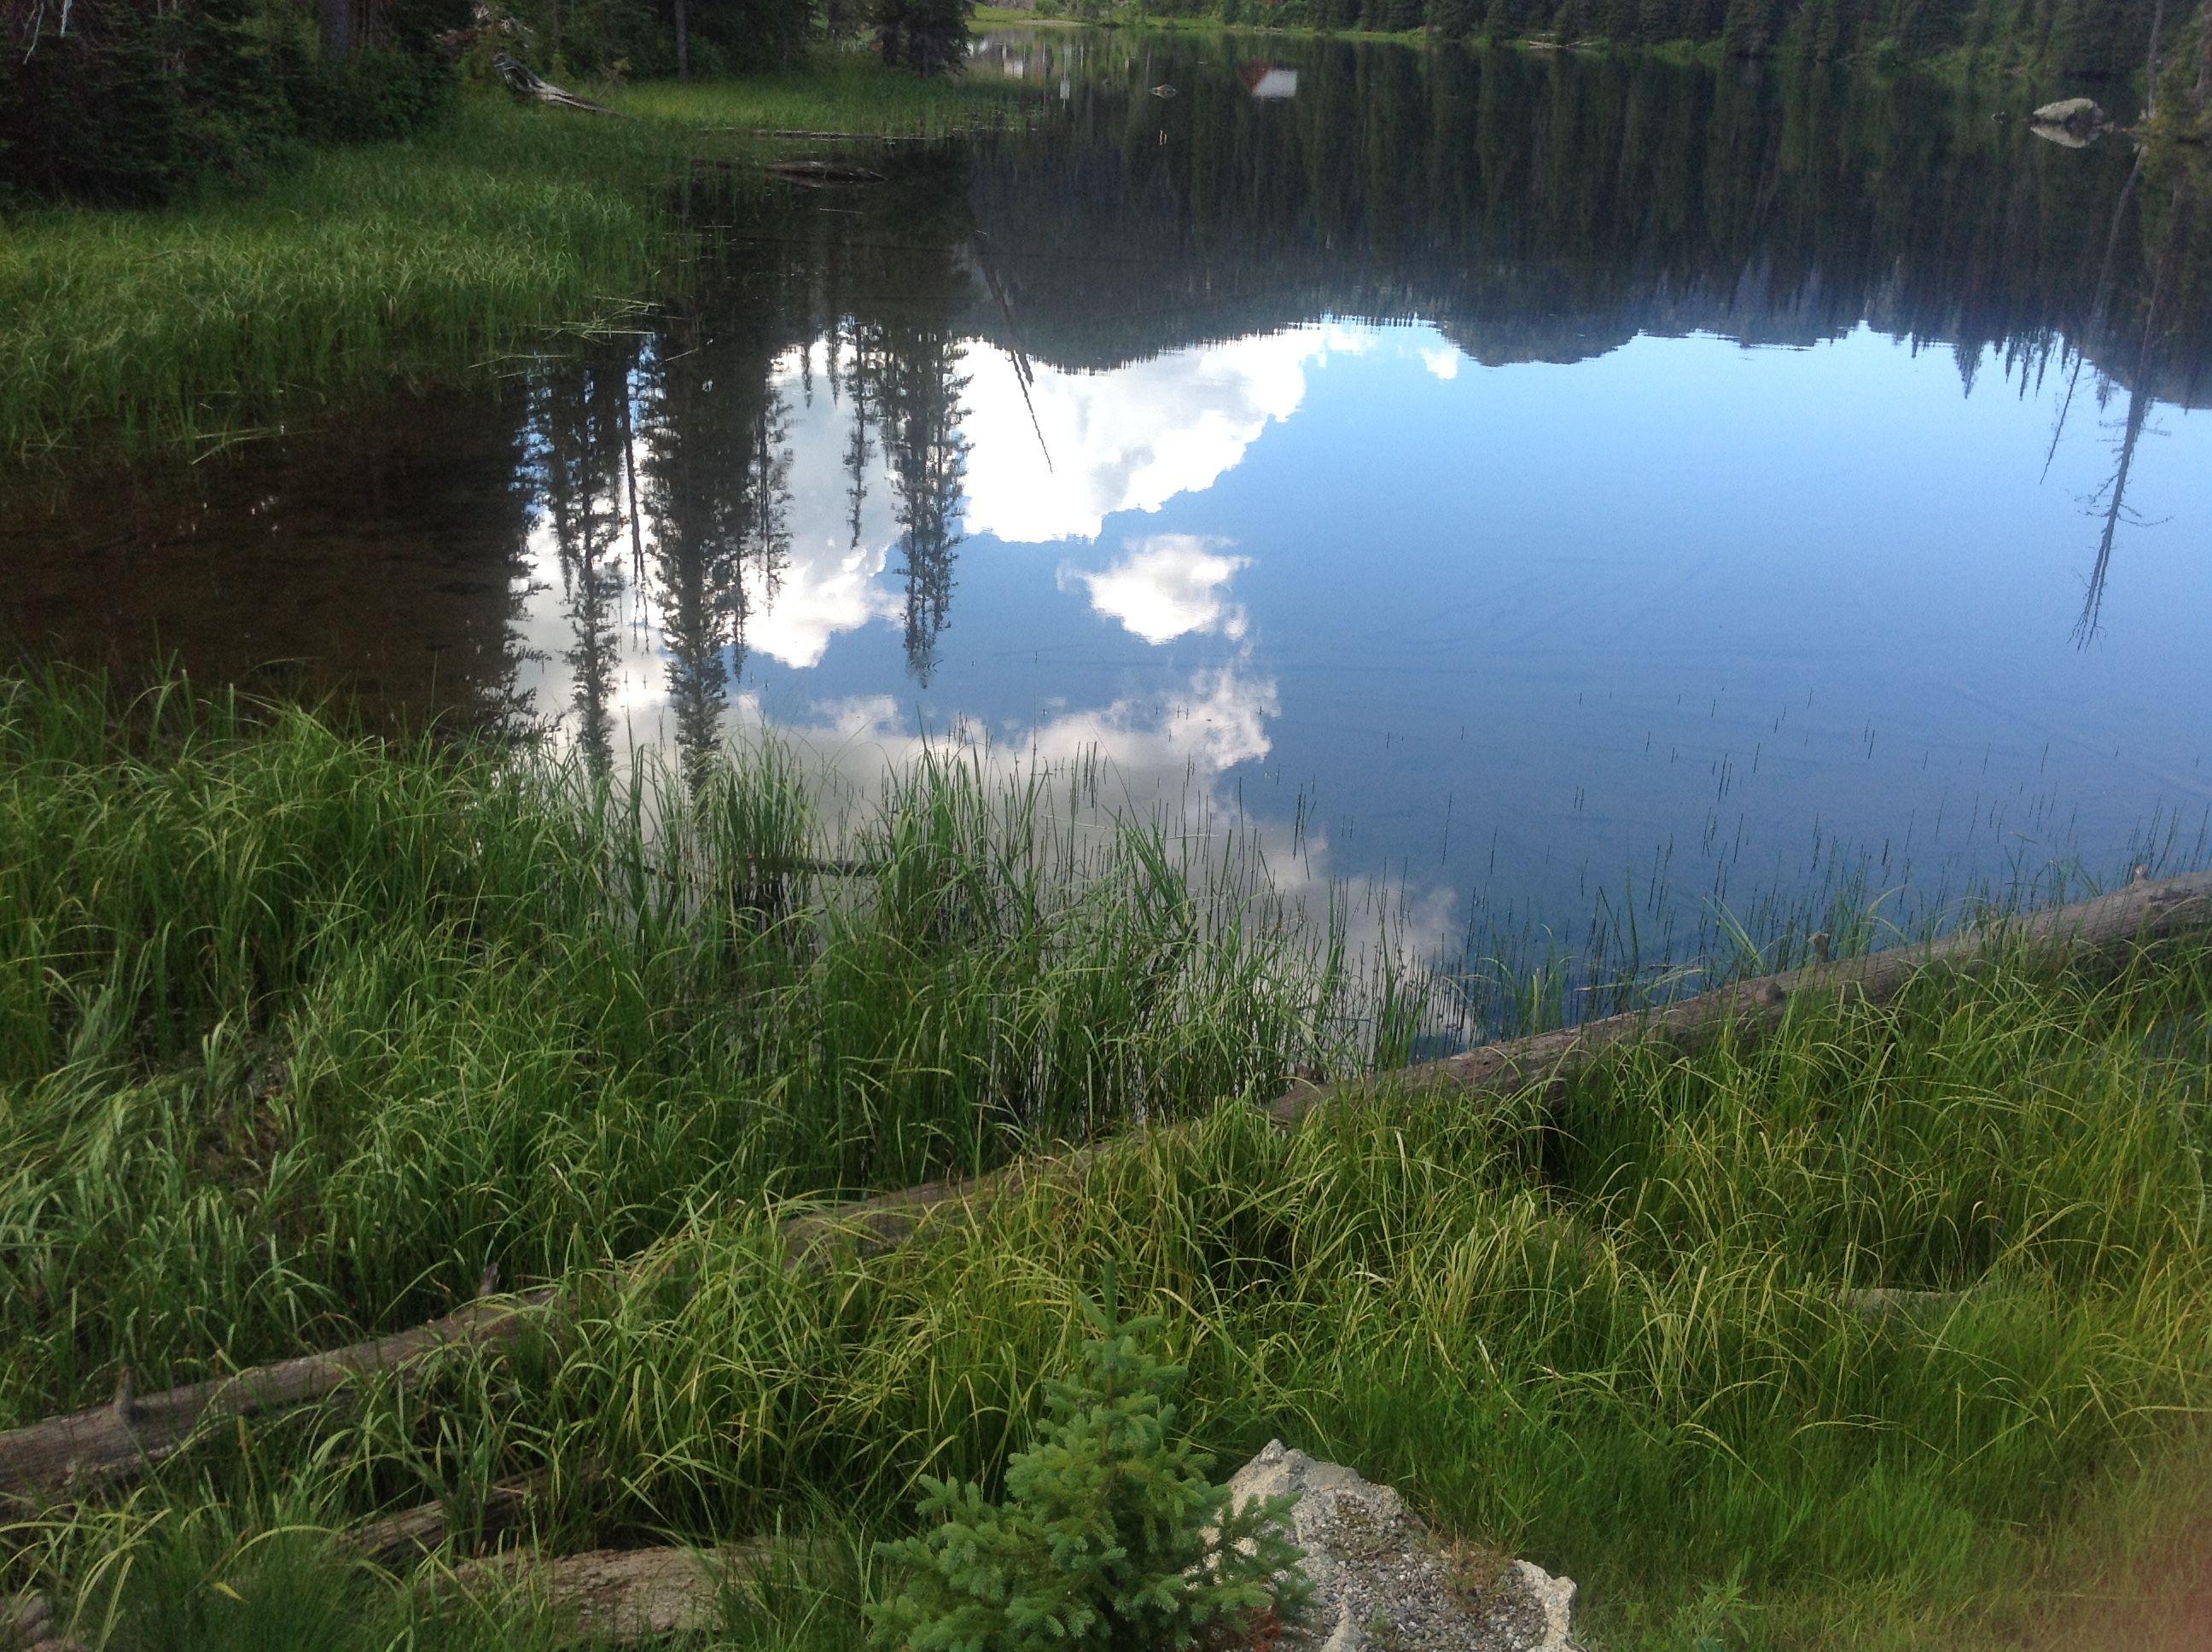 Land of the beautiful.....mountains, lakes and trees  Kootenay Pass BC Canada